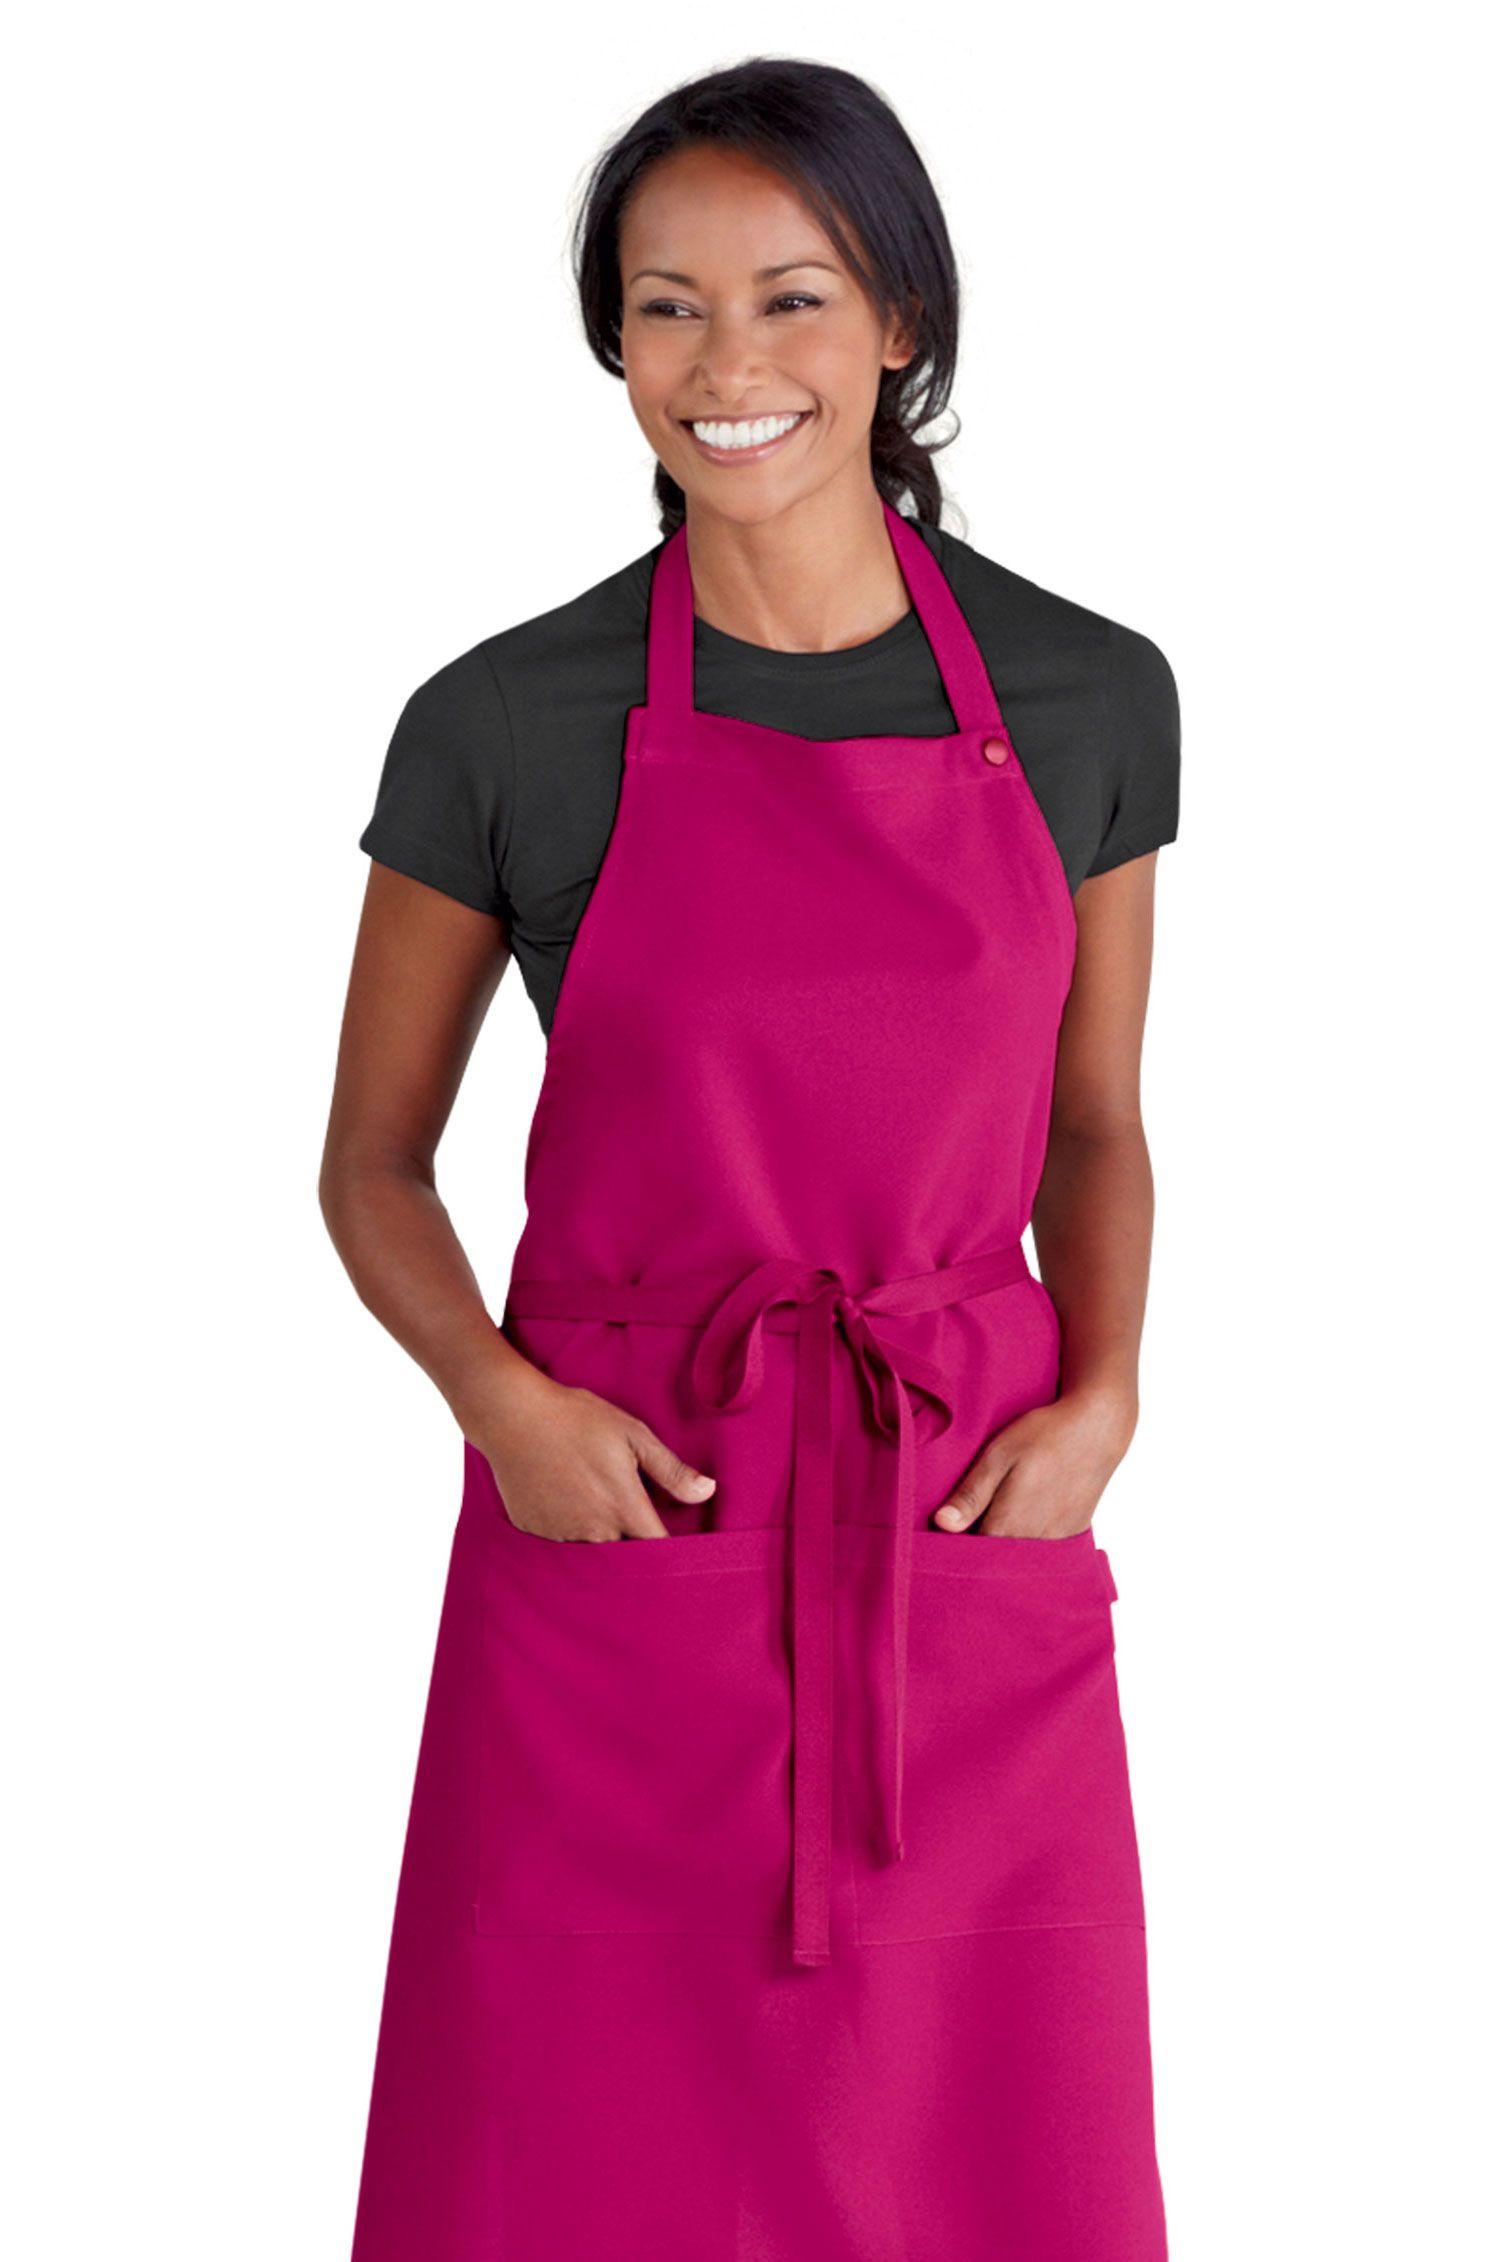 White apron catering menu - Simon Jersey Hot Pink Bib Apron From 6 29 Waiter Apron Waitress Apron